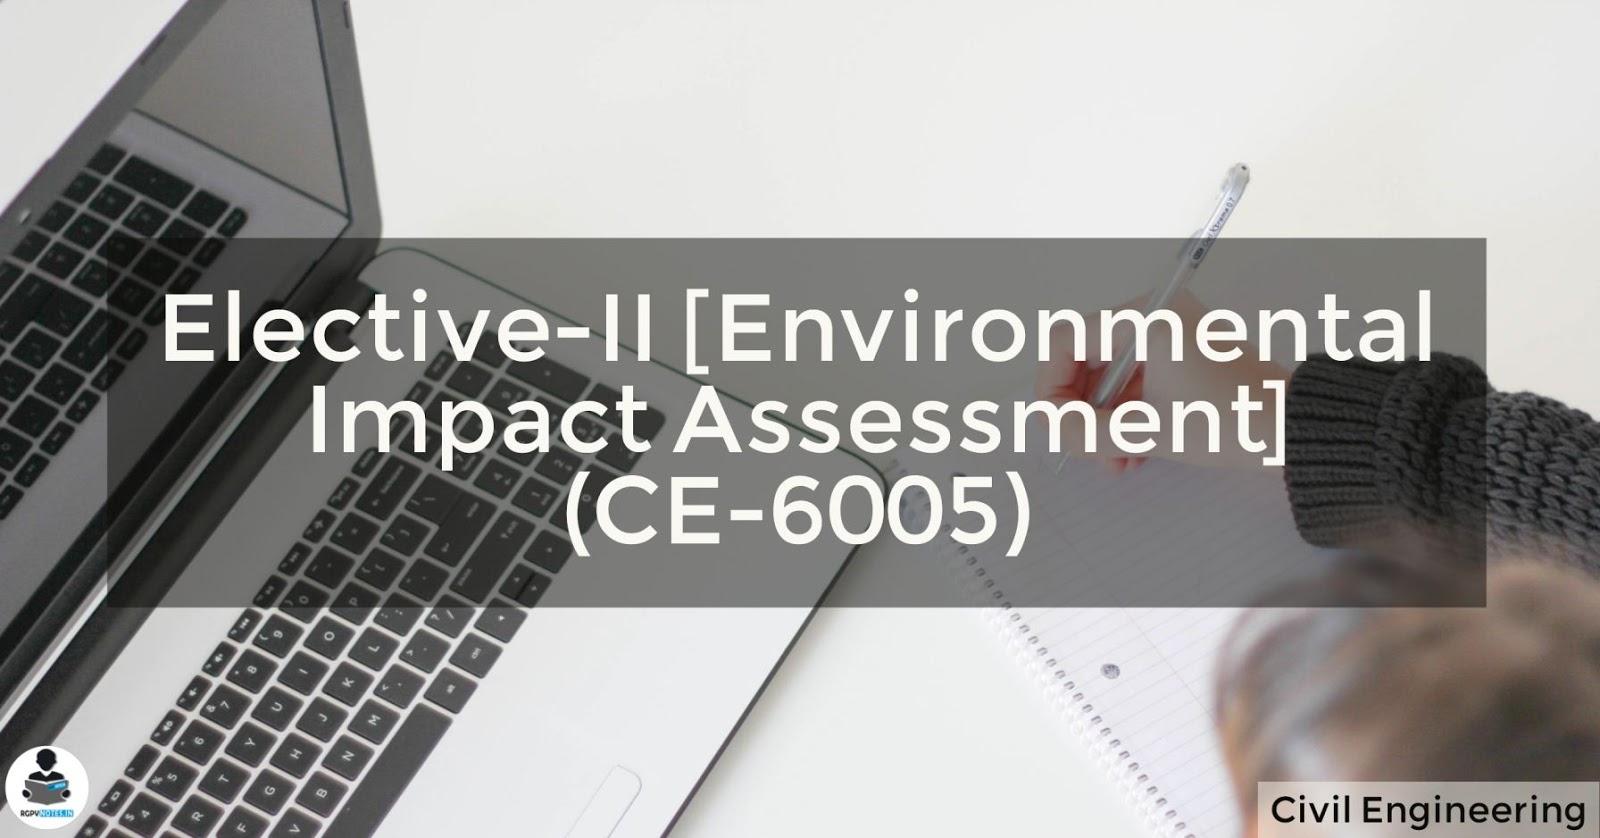 Environmental Impact Assessment (CE-6005)